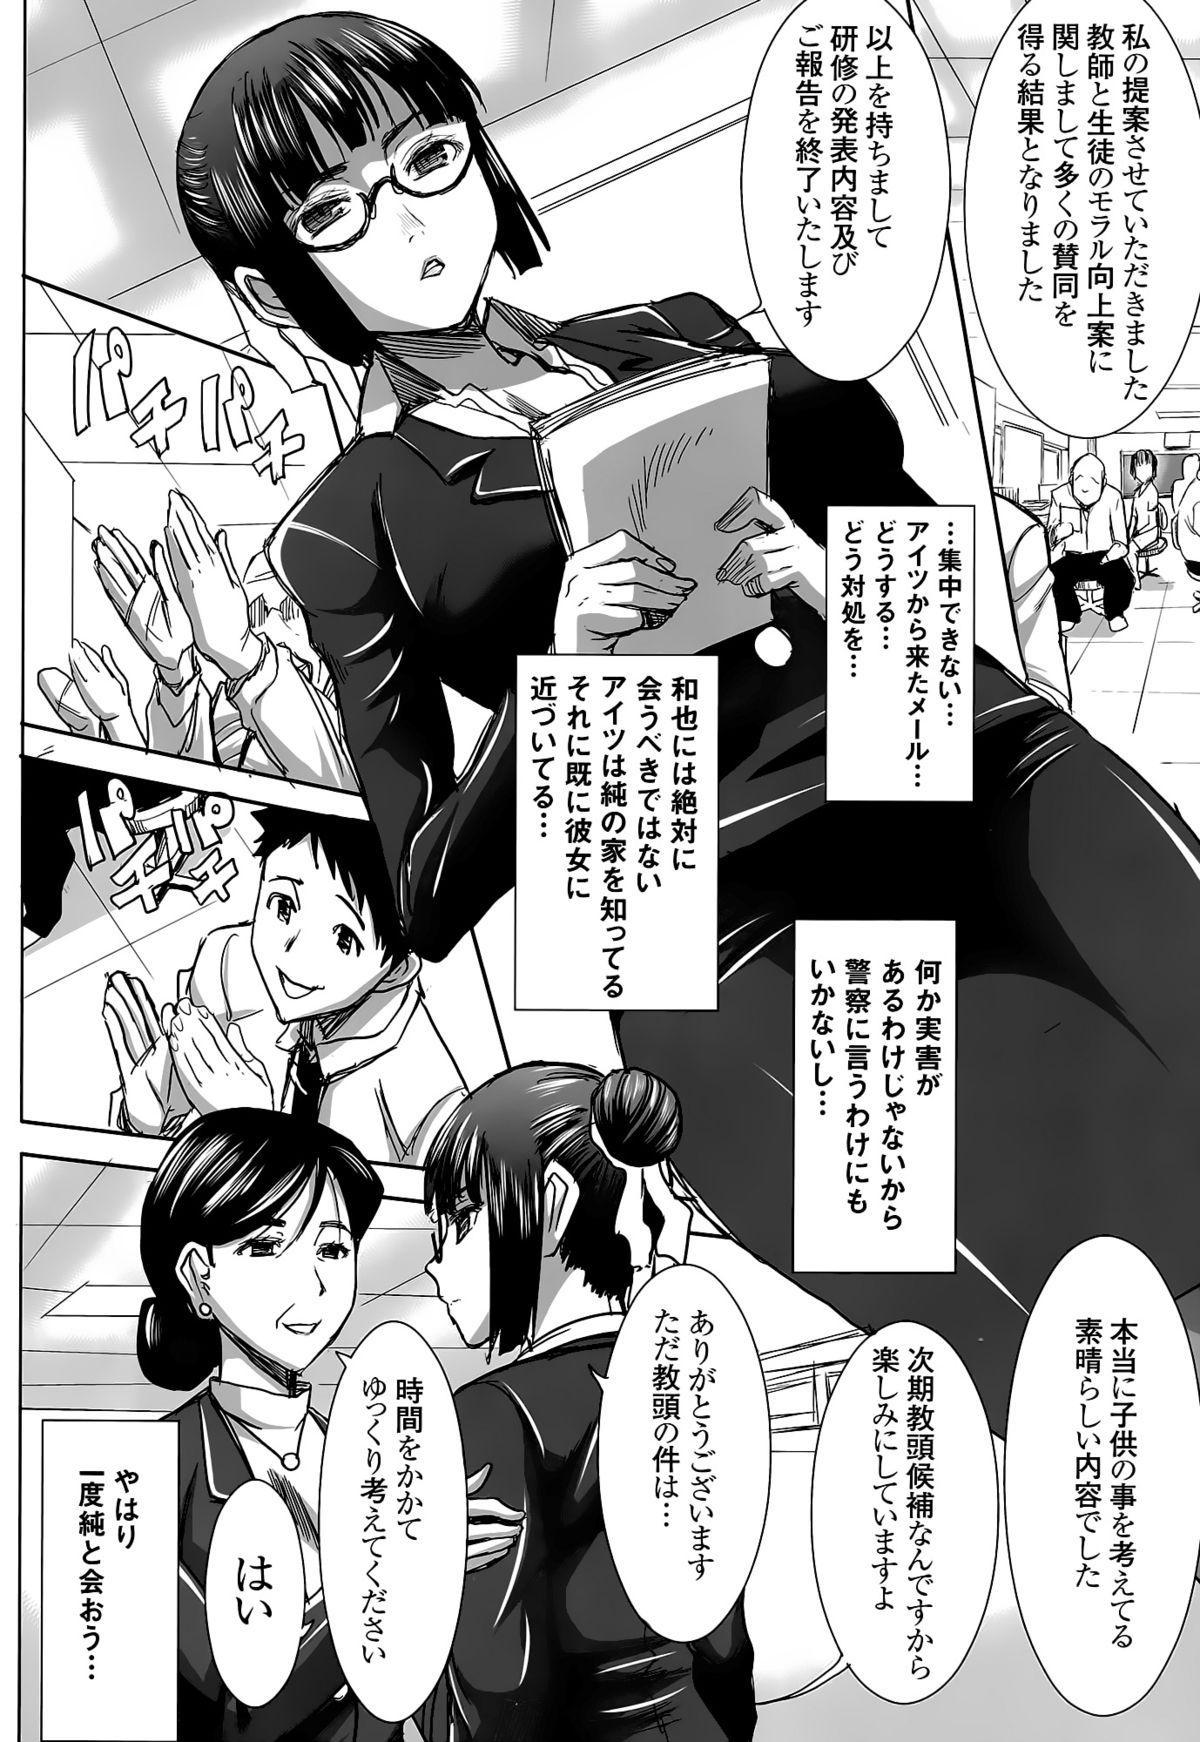 Unsweet Kurose Katsuko Plus Kakugo... 12